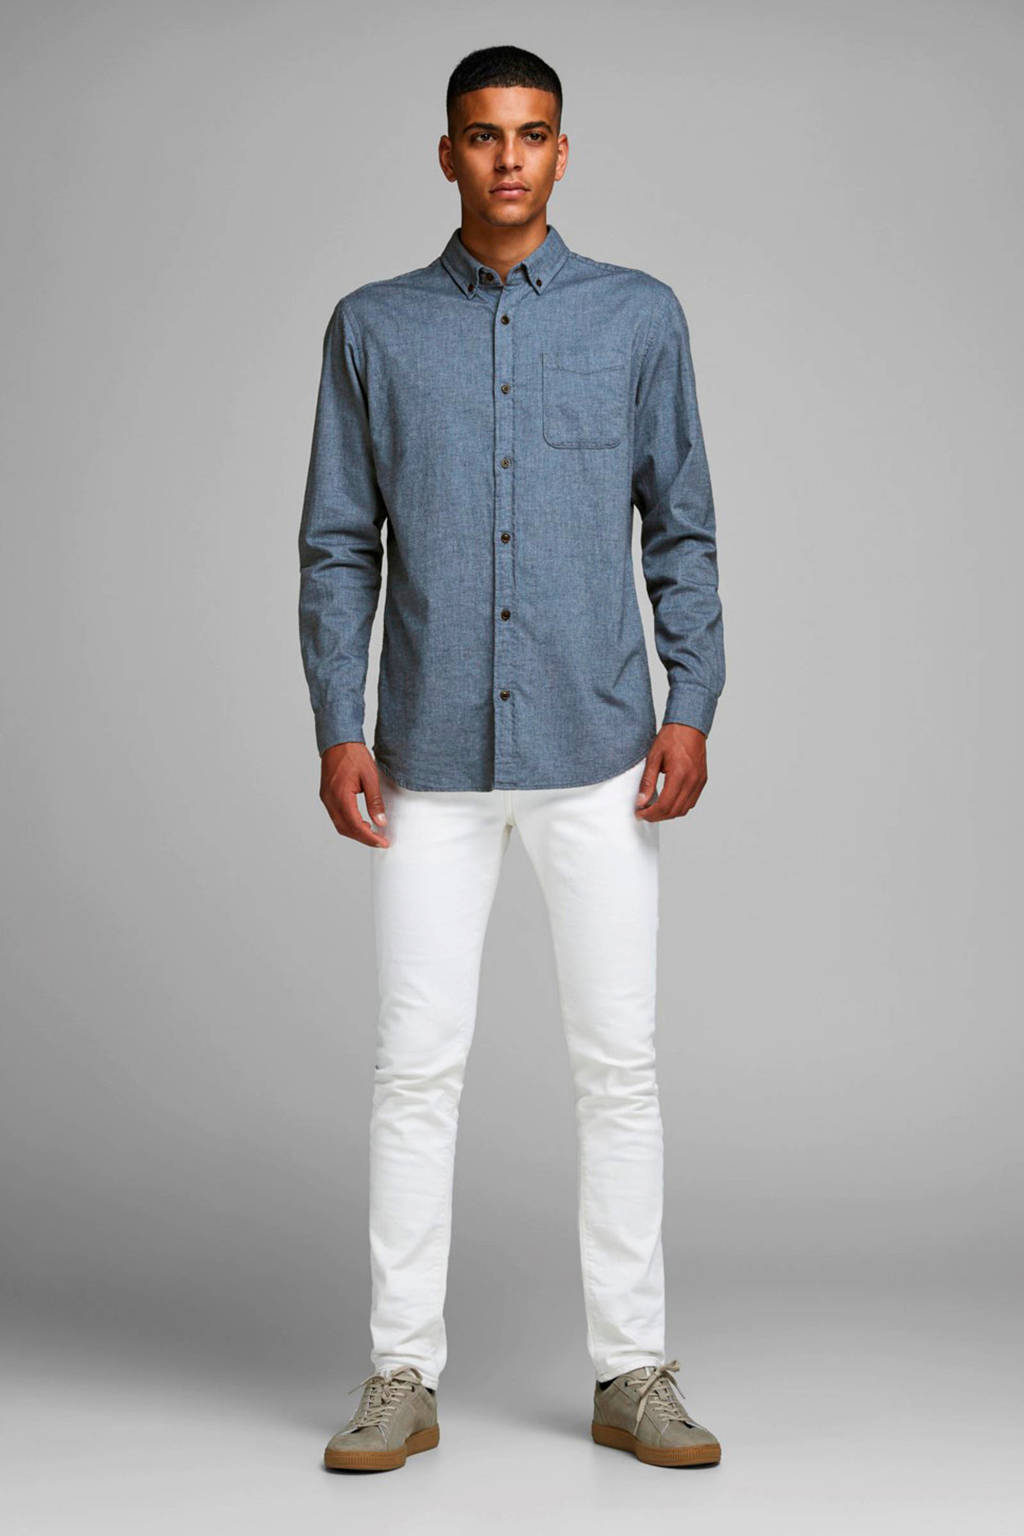 JACK & JONES ESSENTIALS slim fit overhemd blauw, Blauw